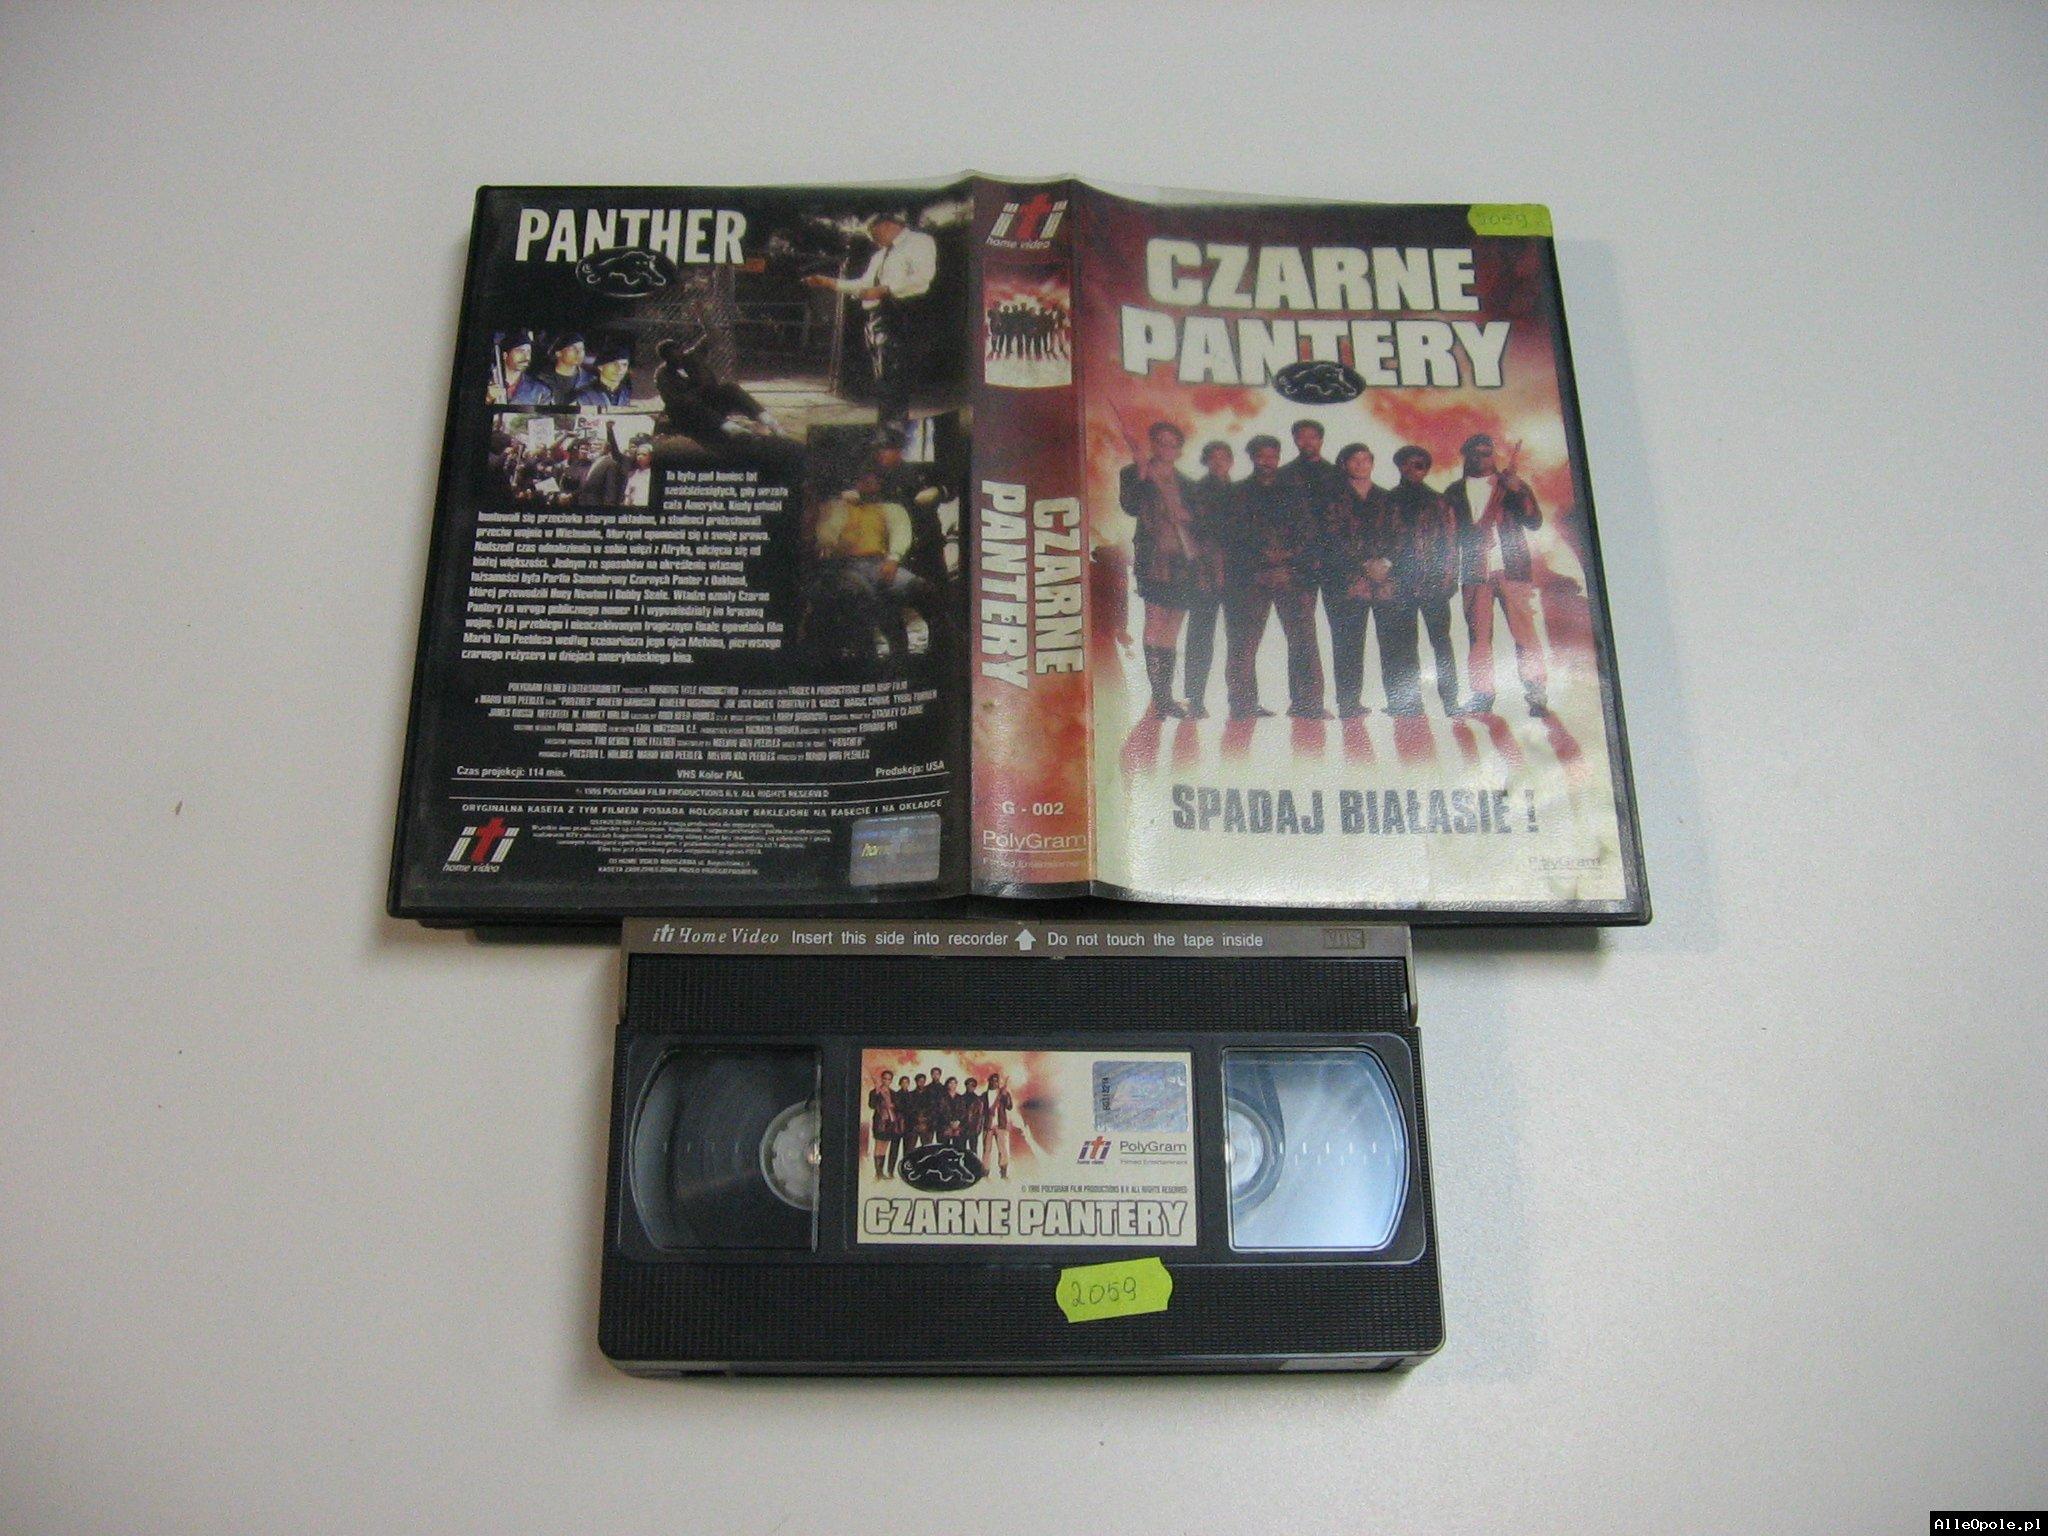 CZARNE PANTERY - VHS Kaseta Video - Opole 1812